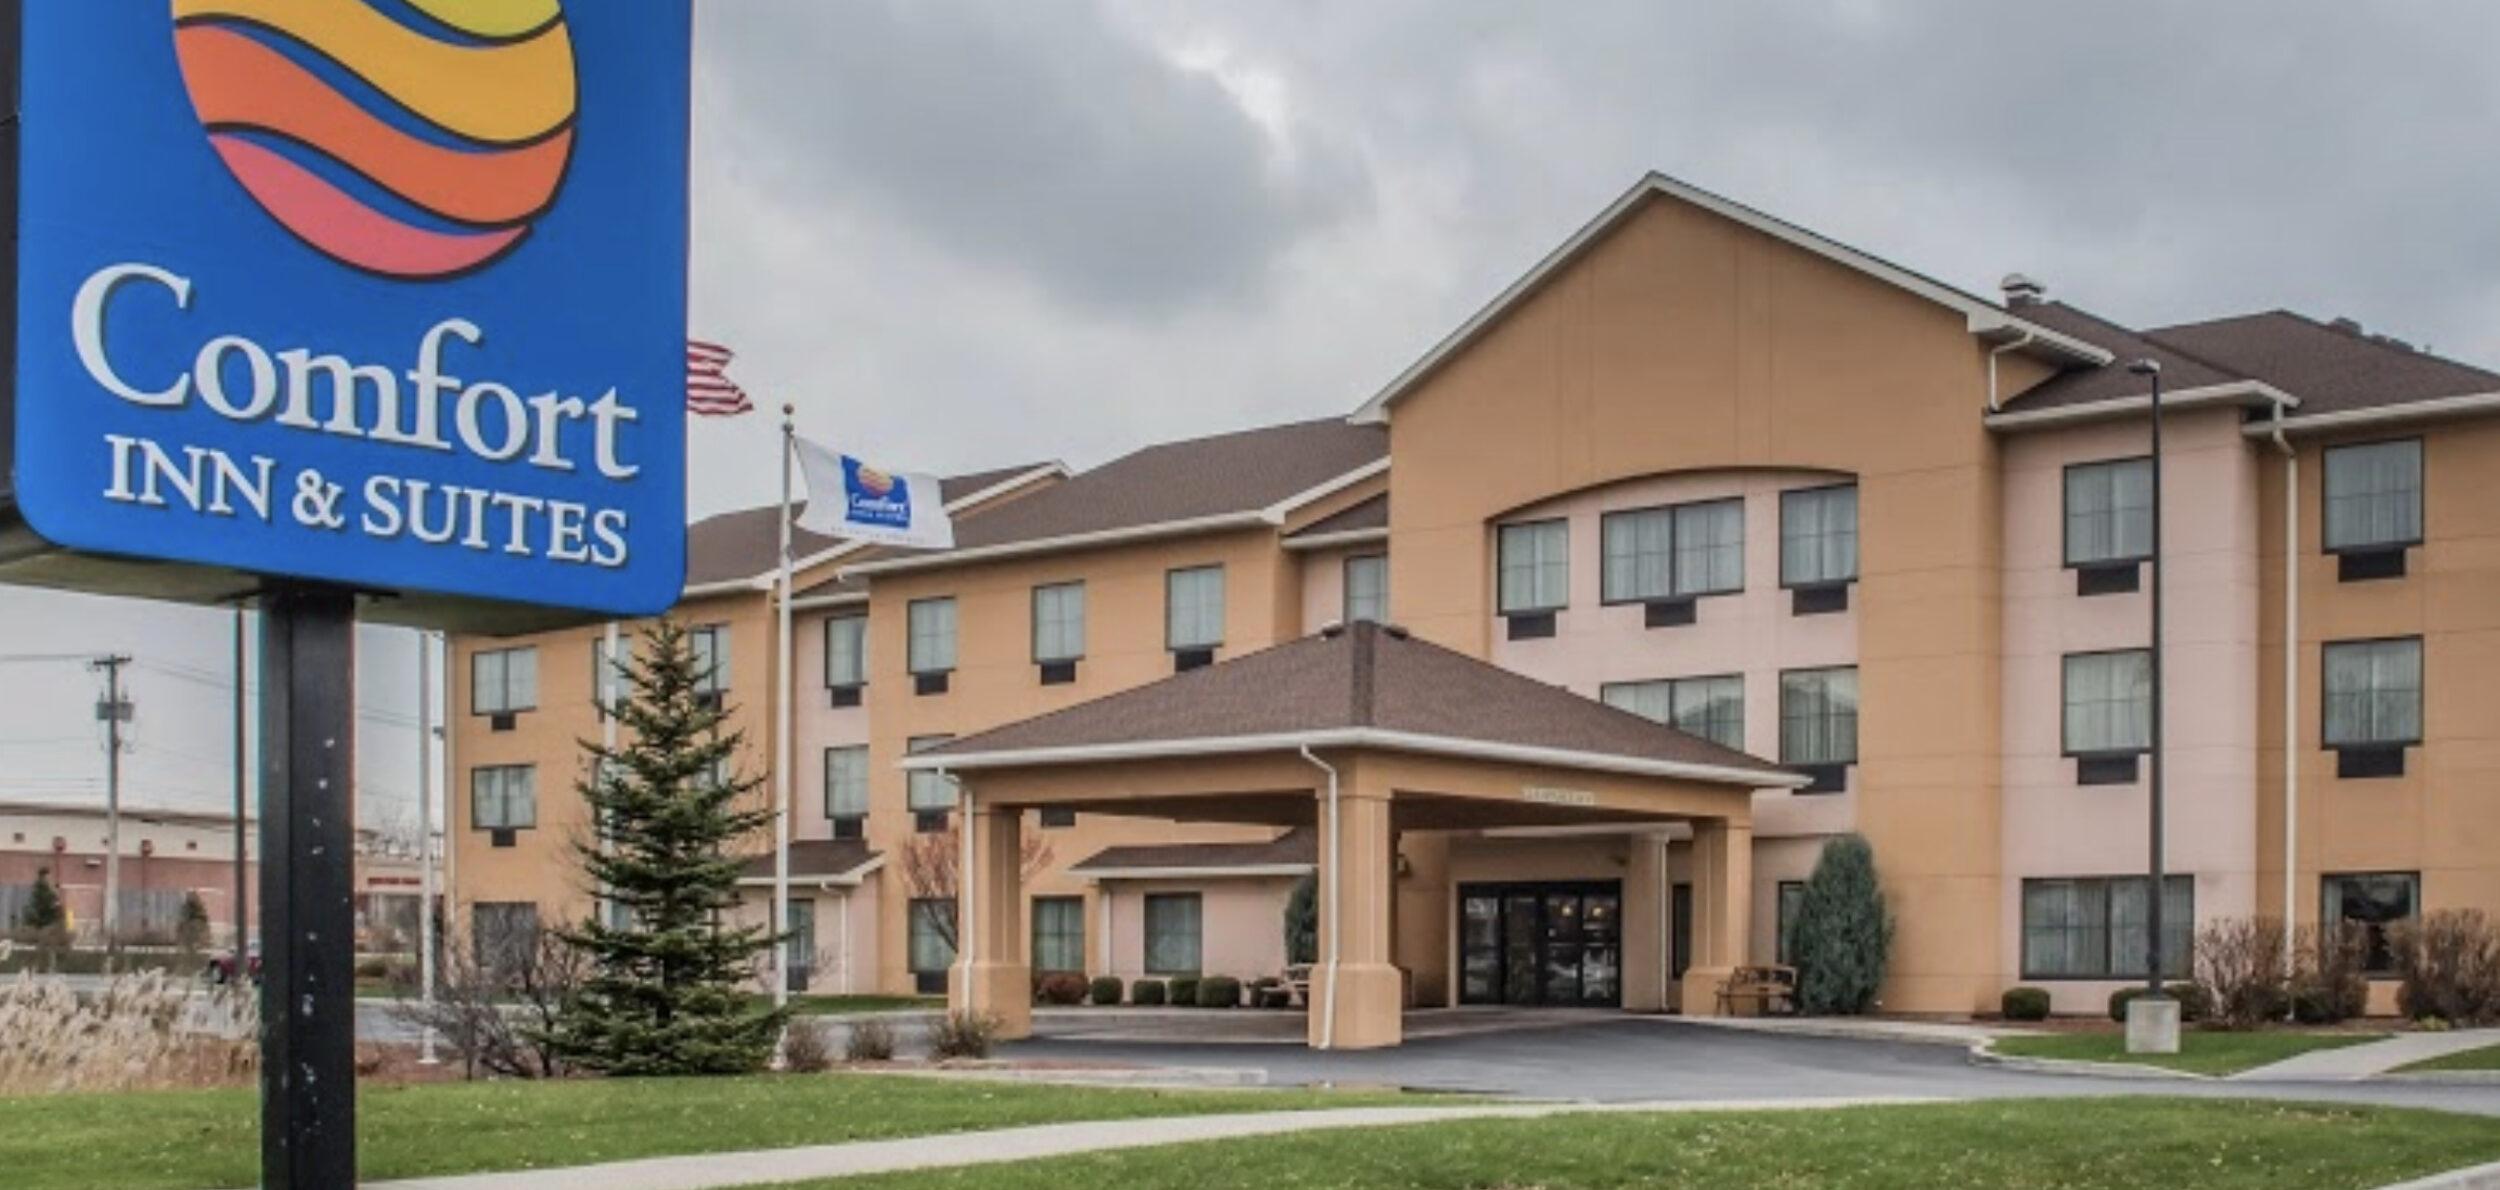 Iversen Construction Comfort Inn And Suites Farmington Ny Hospitality